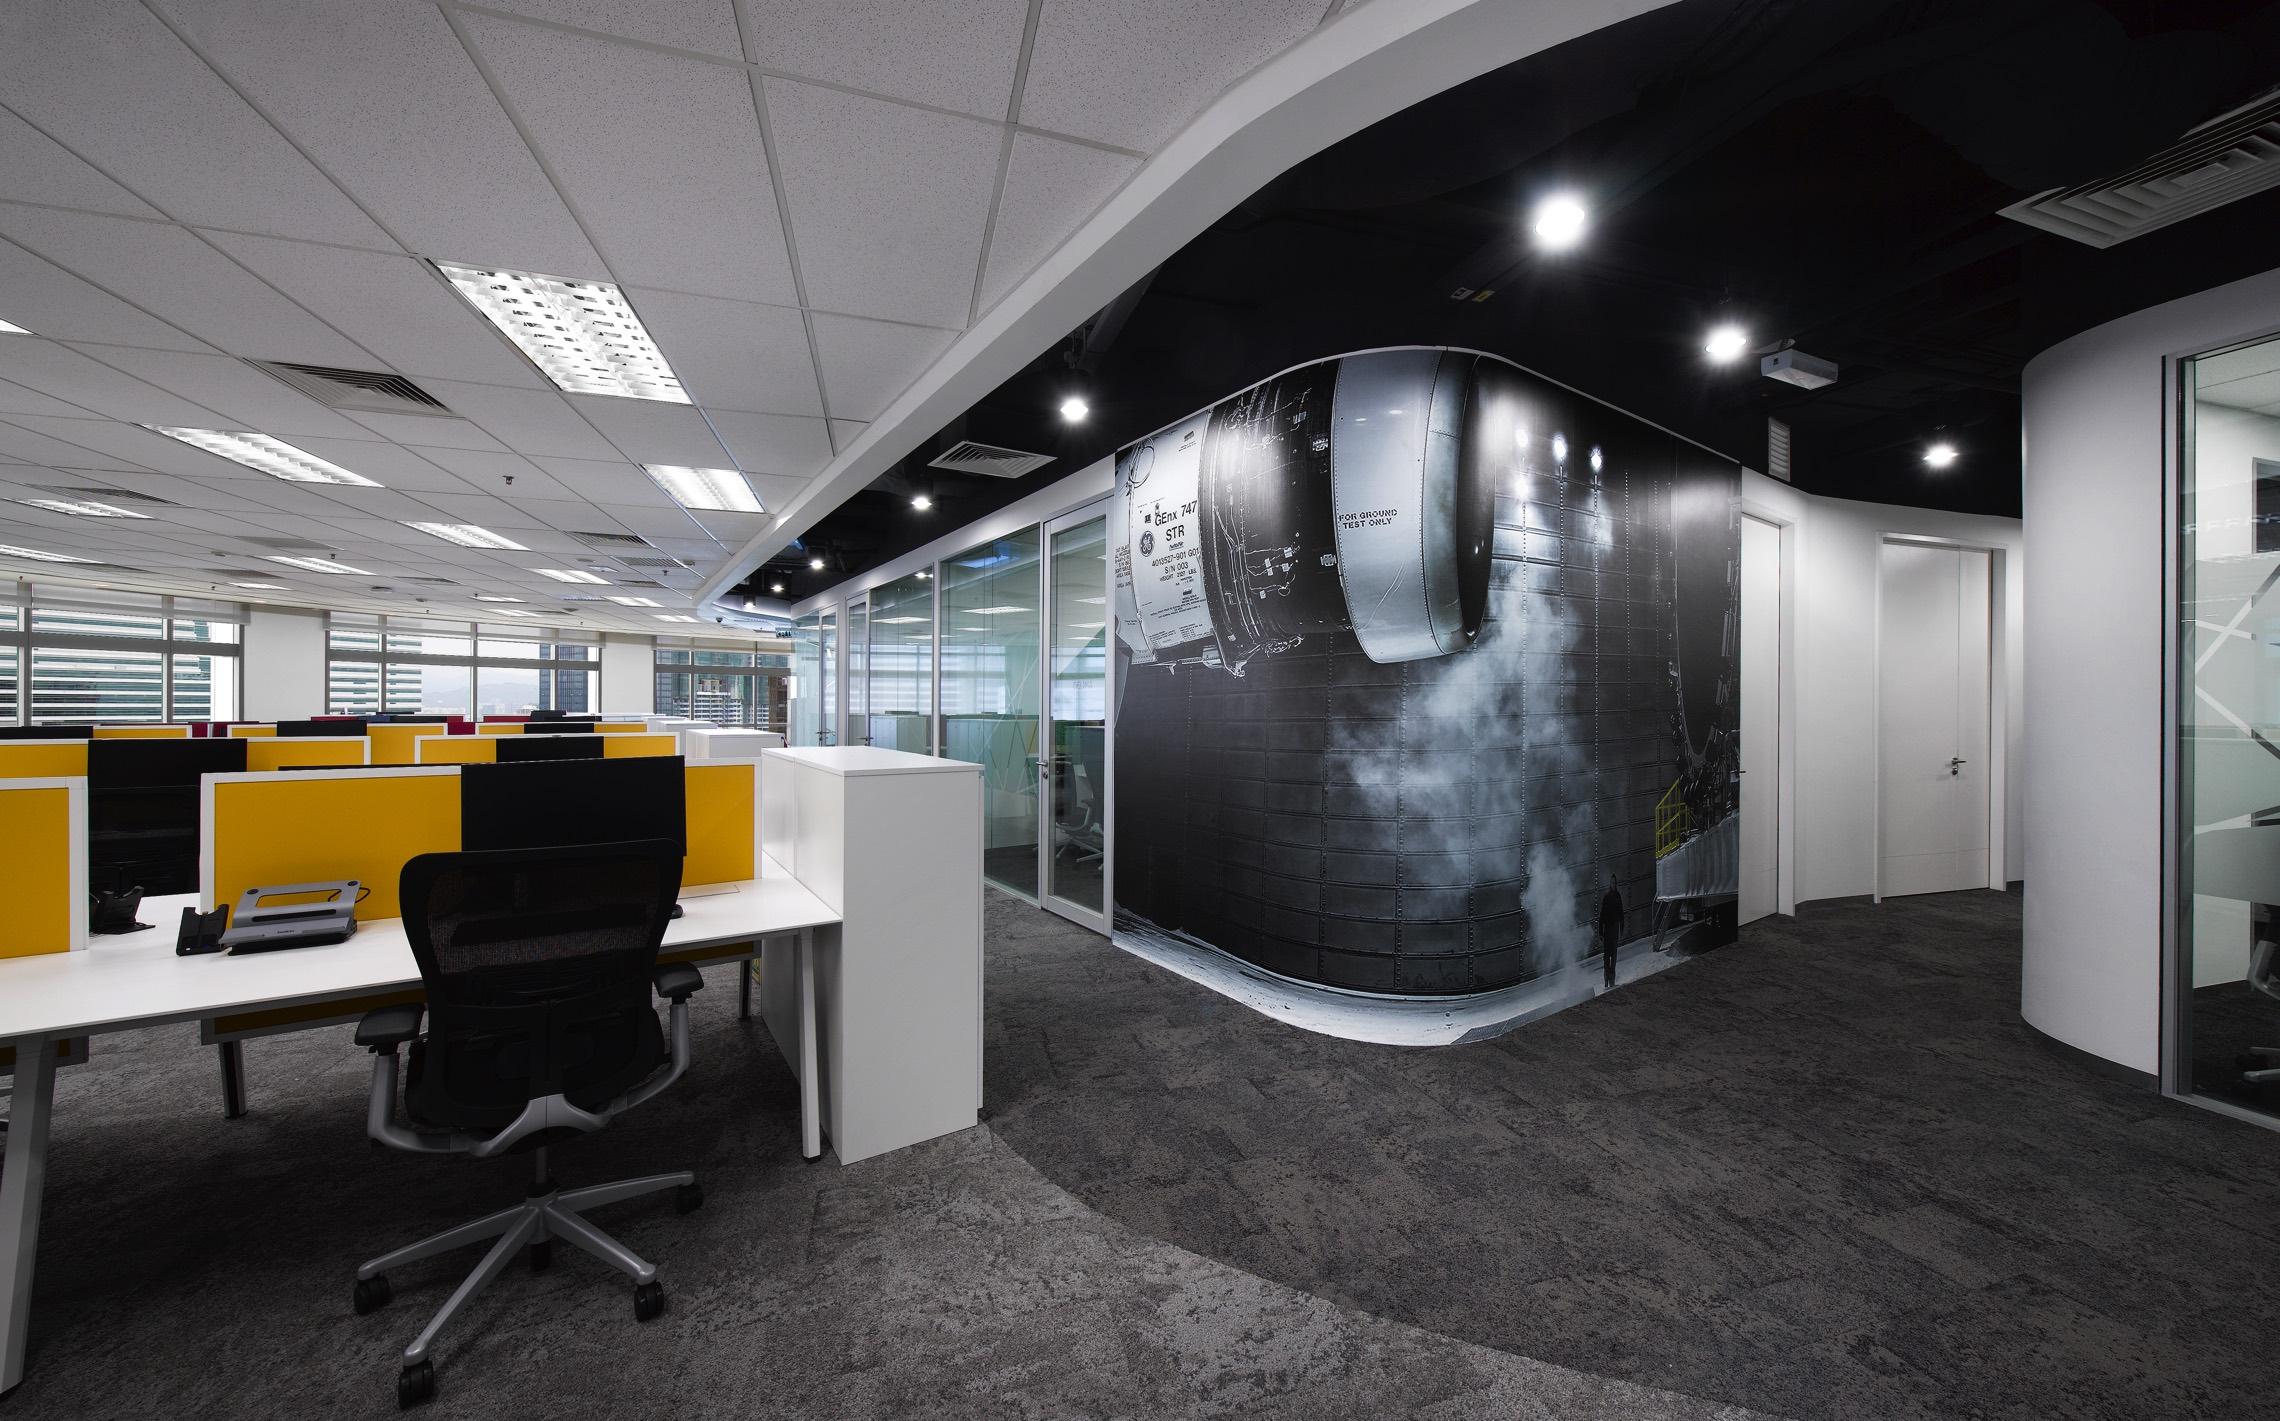 Ge kuala lumpur office inspiration for Office design kuala lumpur